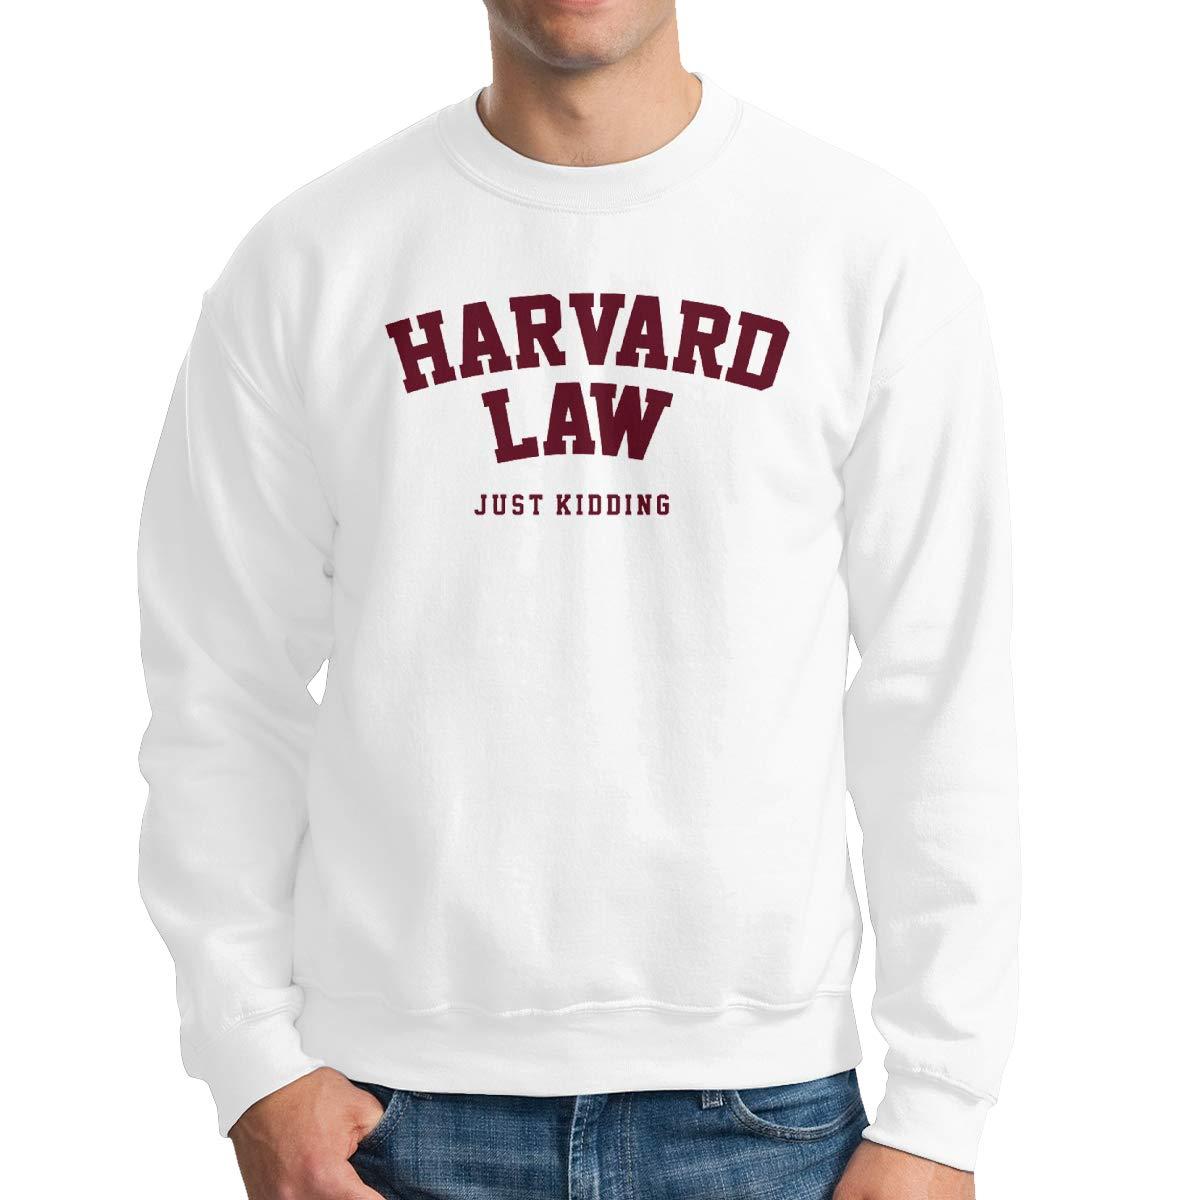 JJHH Shop Harvard Law Just Kidding Mens Boys Crewneck Basketball Team Unisex Pullover Sweatshirt Crew Neck Hoodie